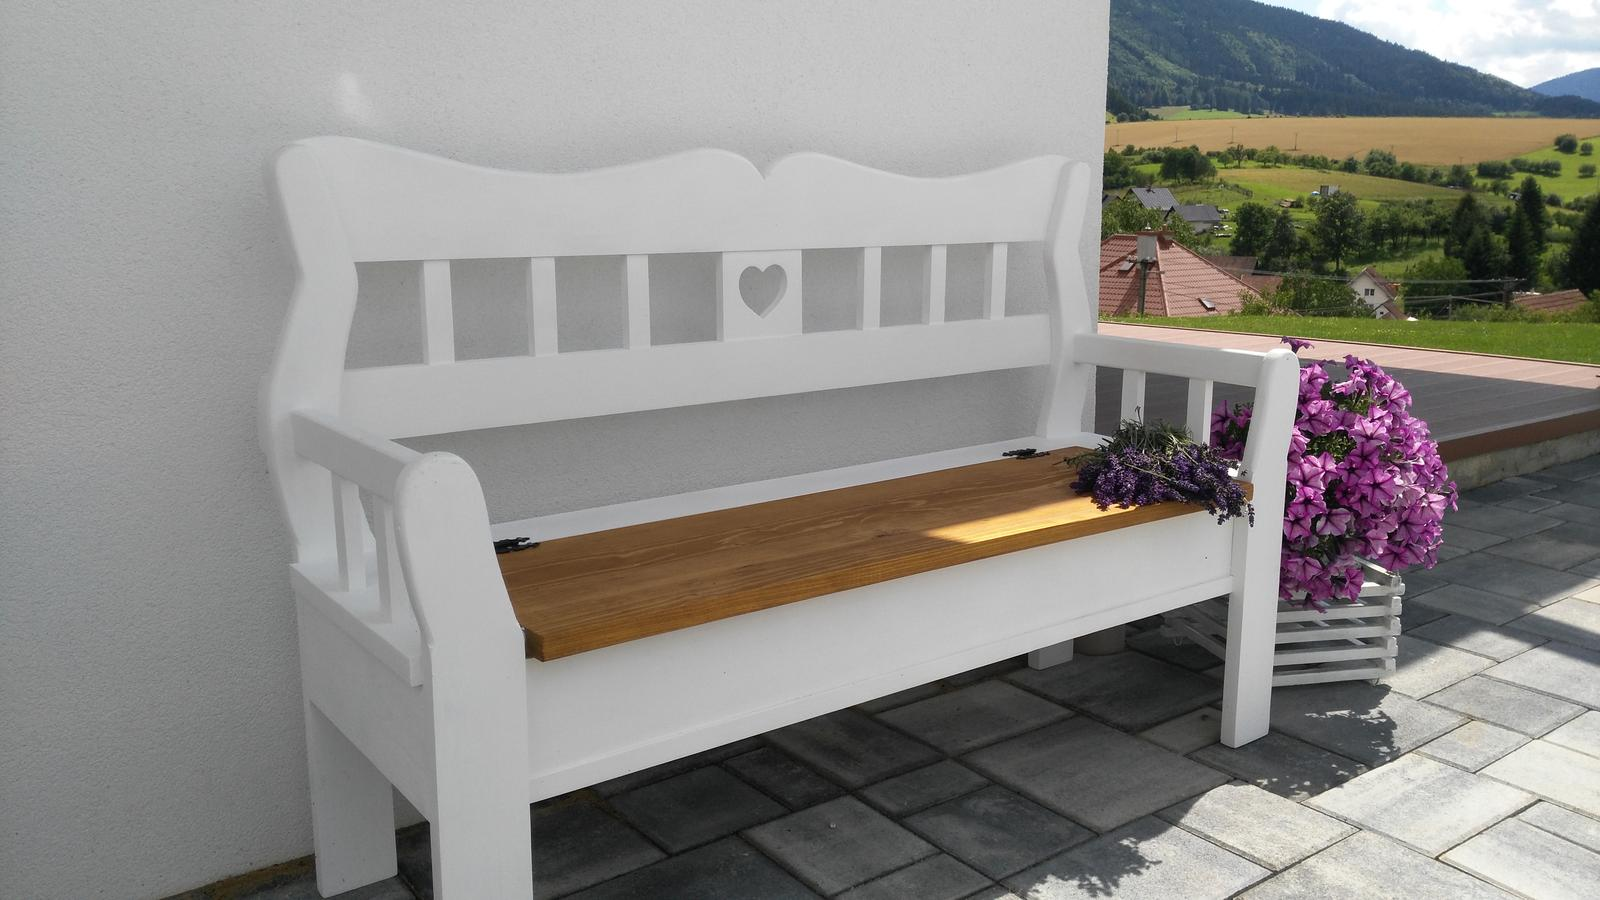 Domček na kopčeku - moje potešenie,už ako malá som ju vždy chcela mat....babičkovsku lavičku